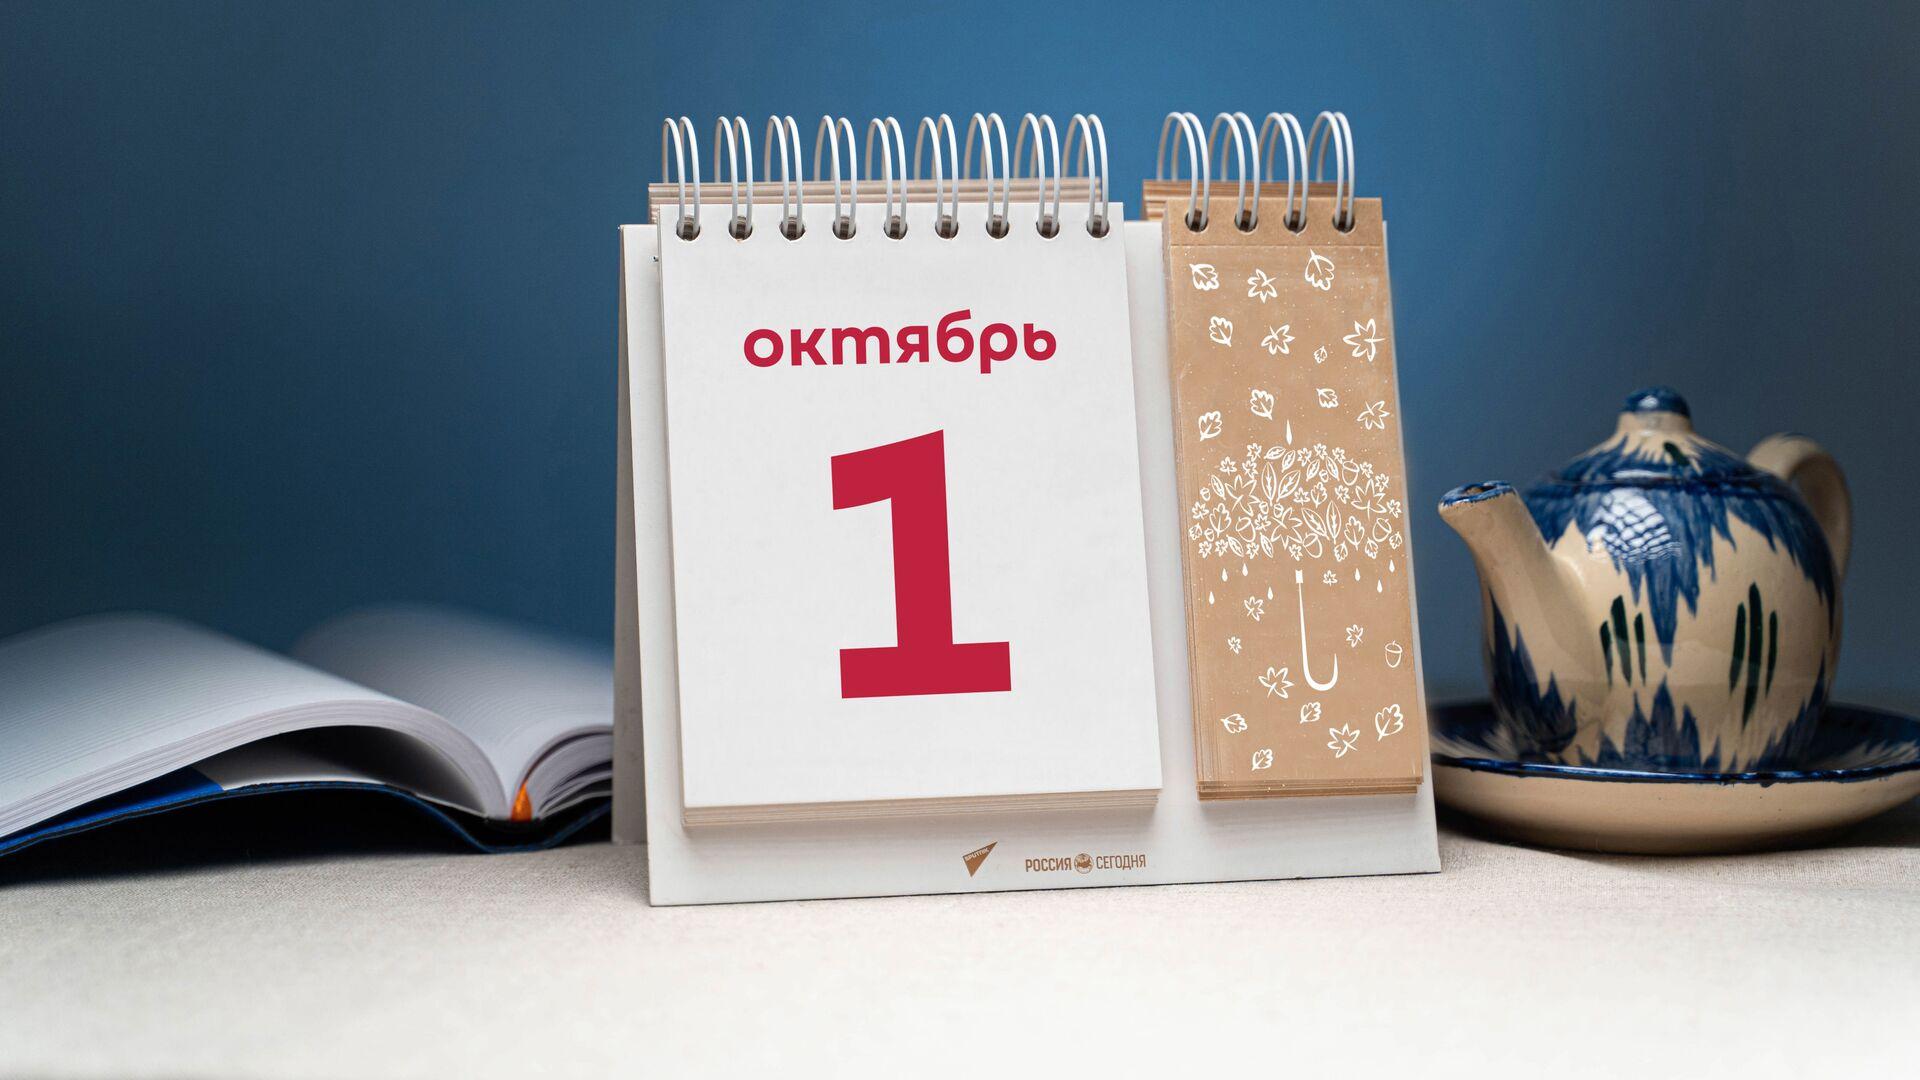 День 1 октября - Sputnik Тоҷикистон, 1920, 01.10.2021